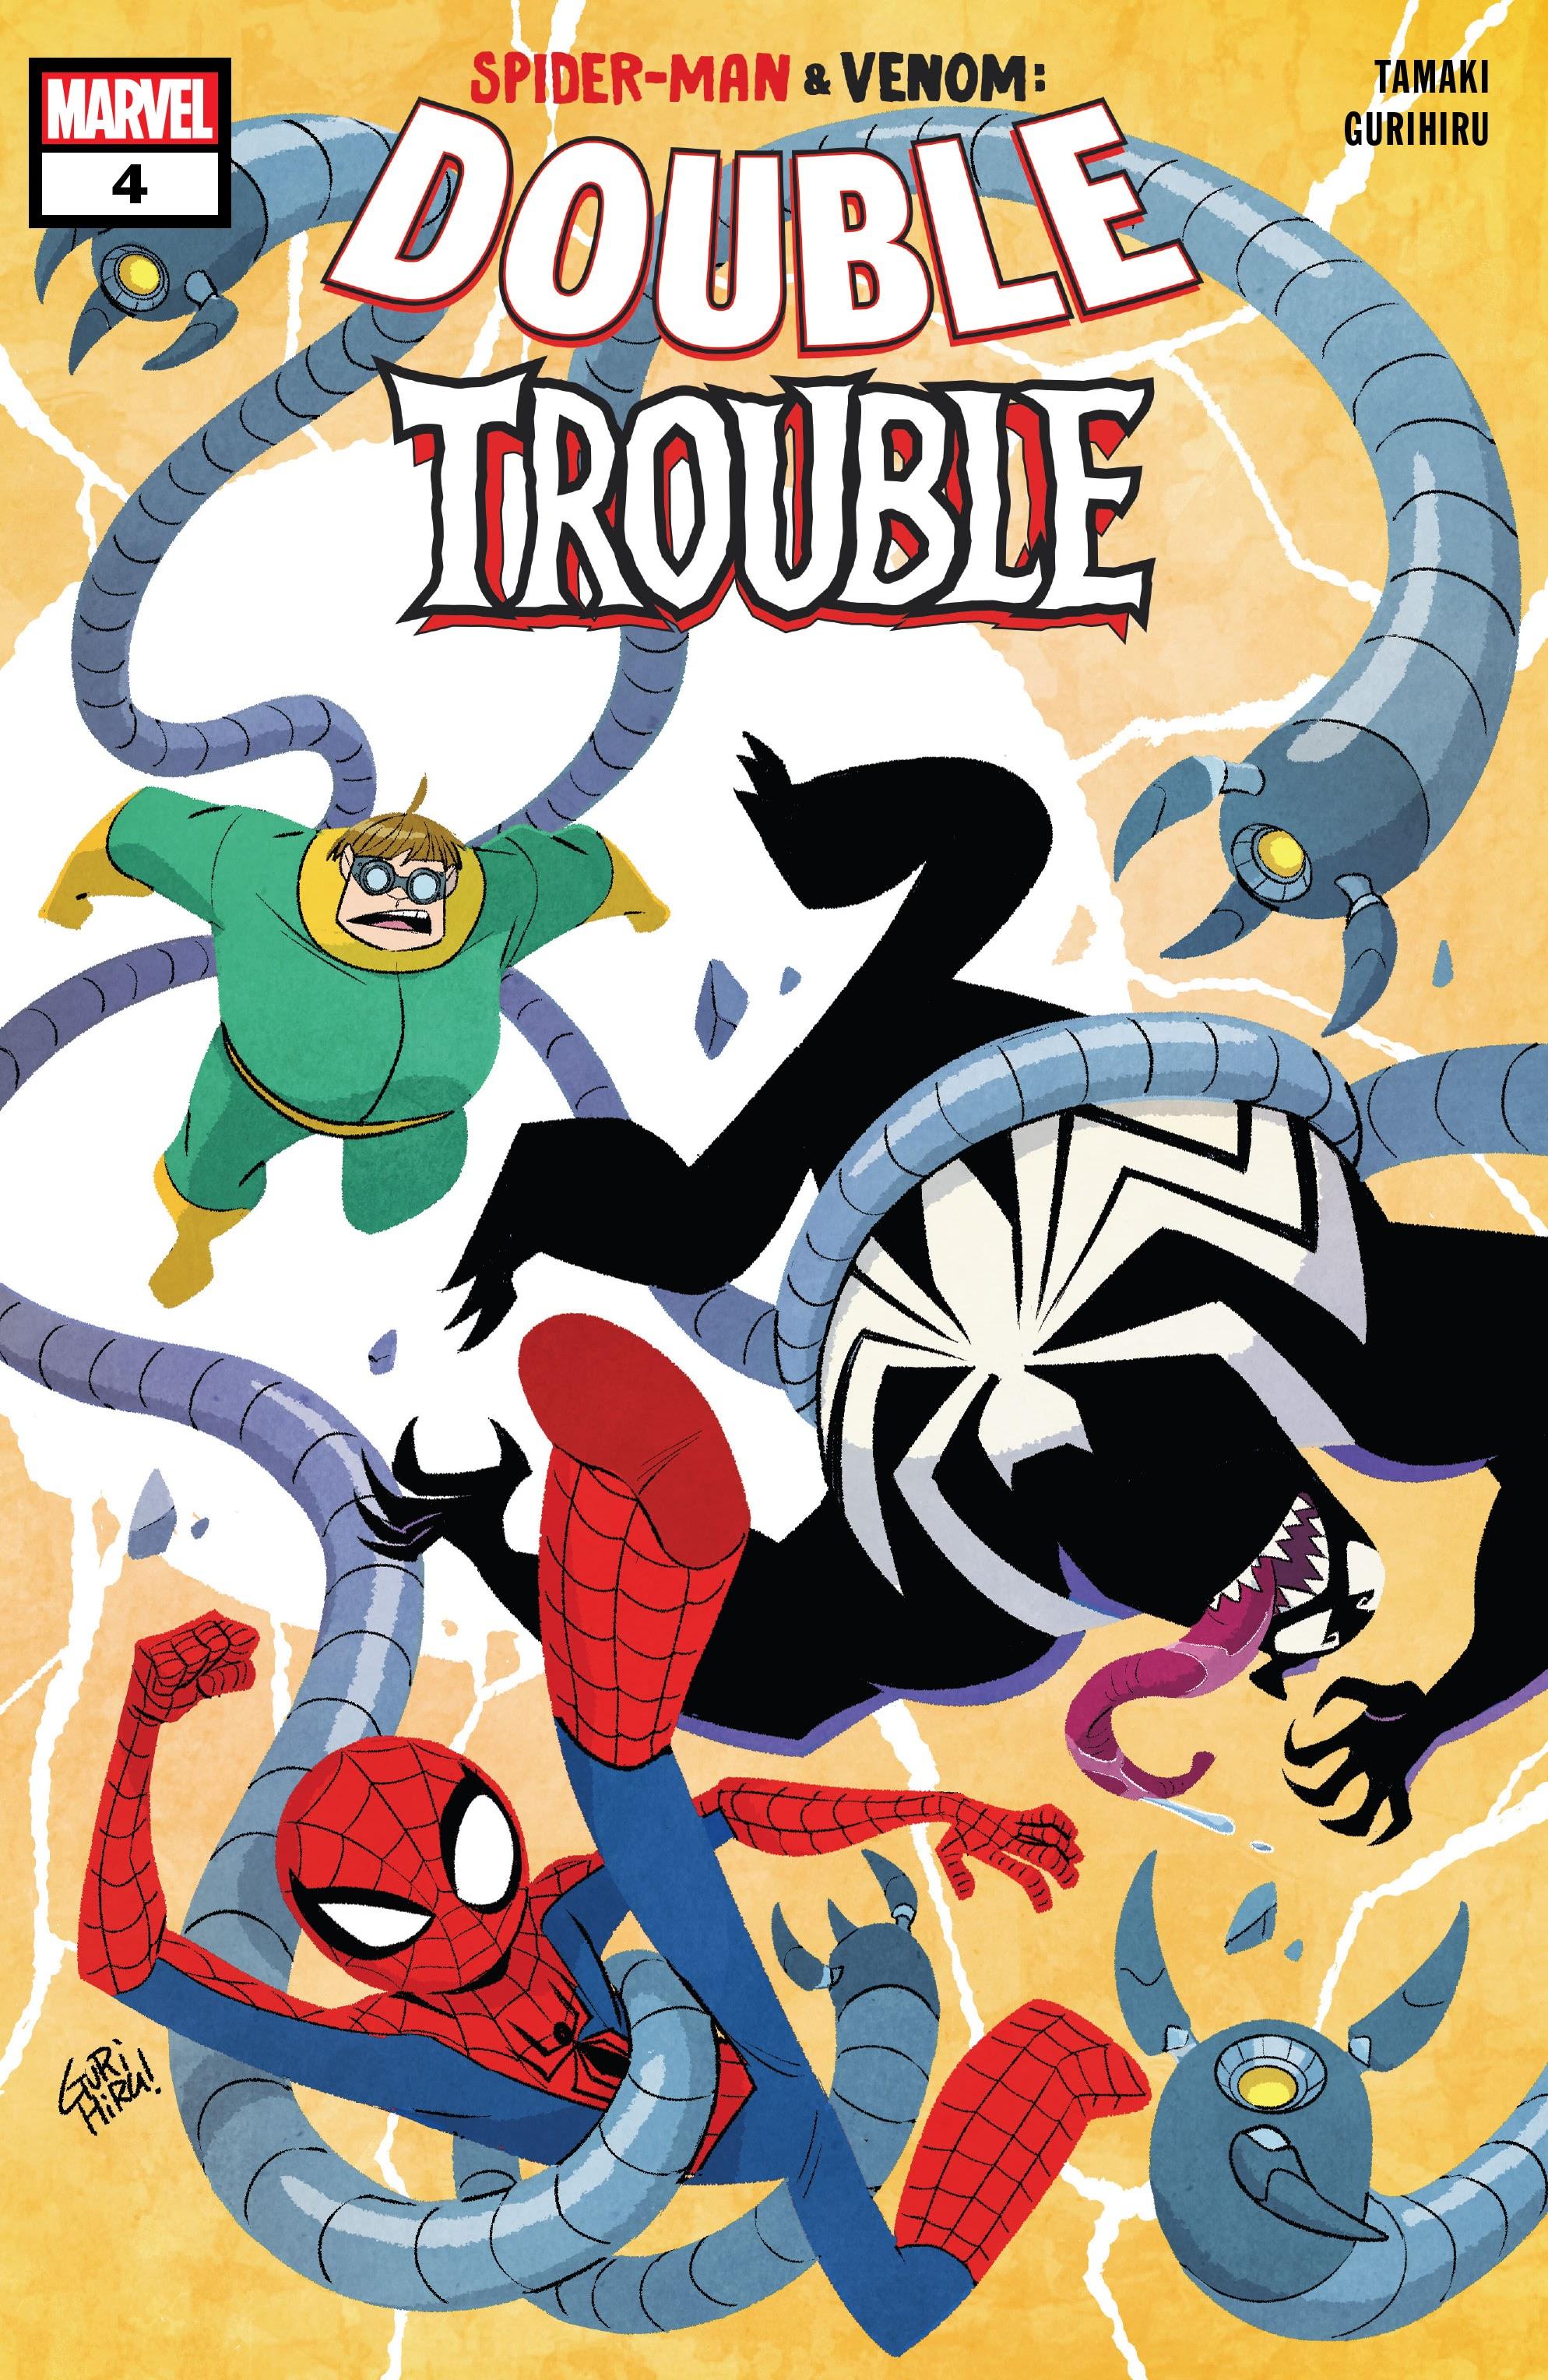 Spider-Man & Venom: Double Trouble 4 Page 1